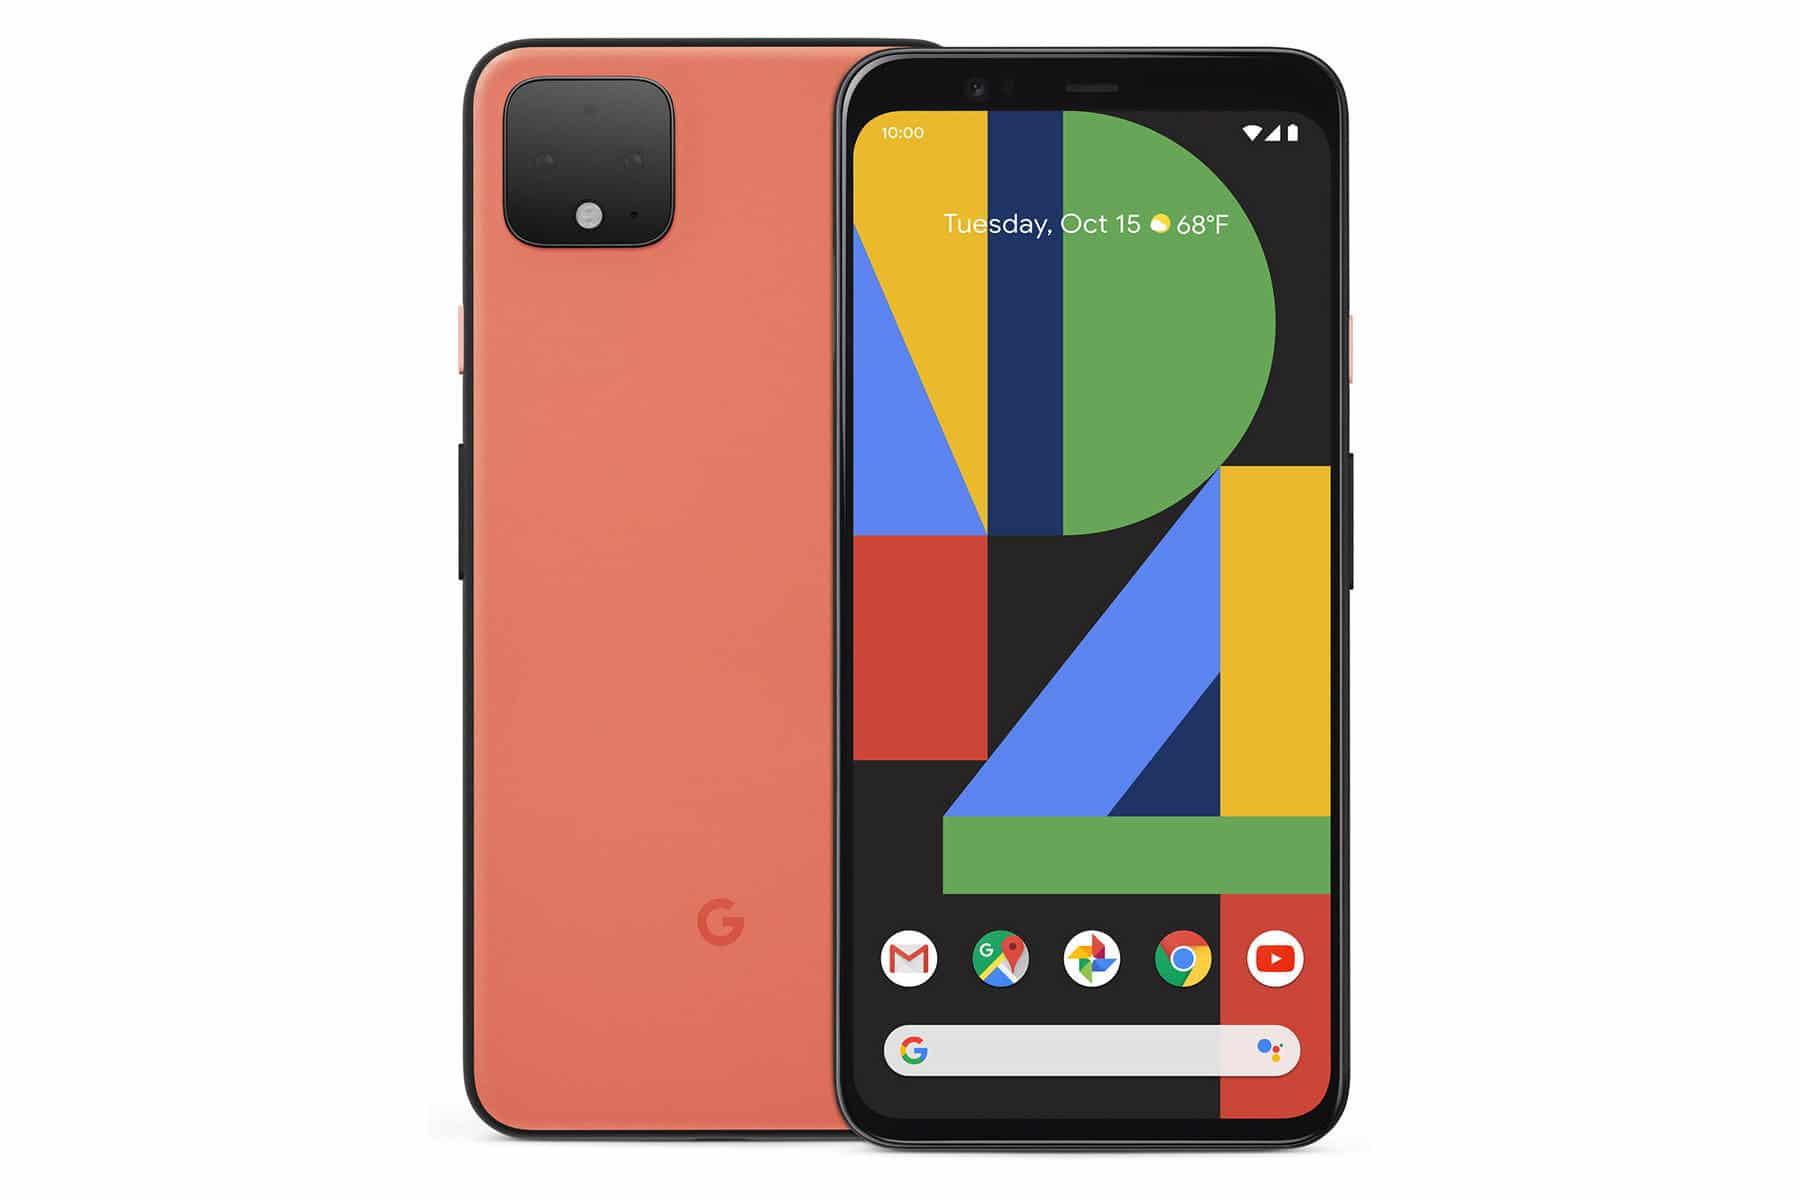 google pixel 4 vr